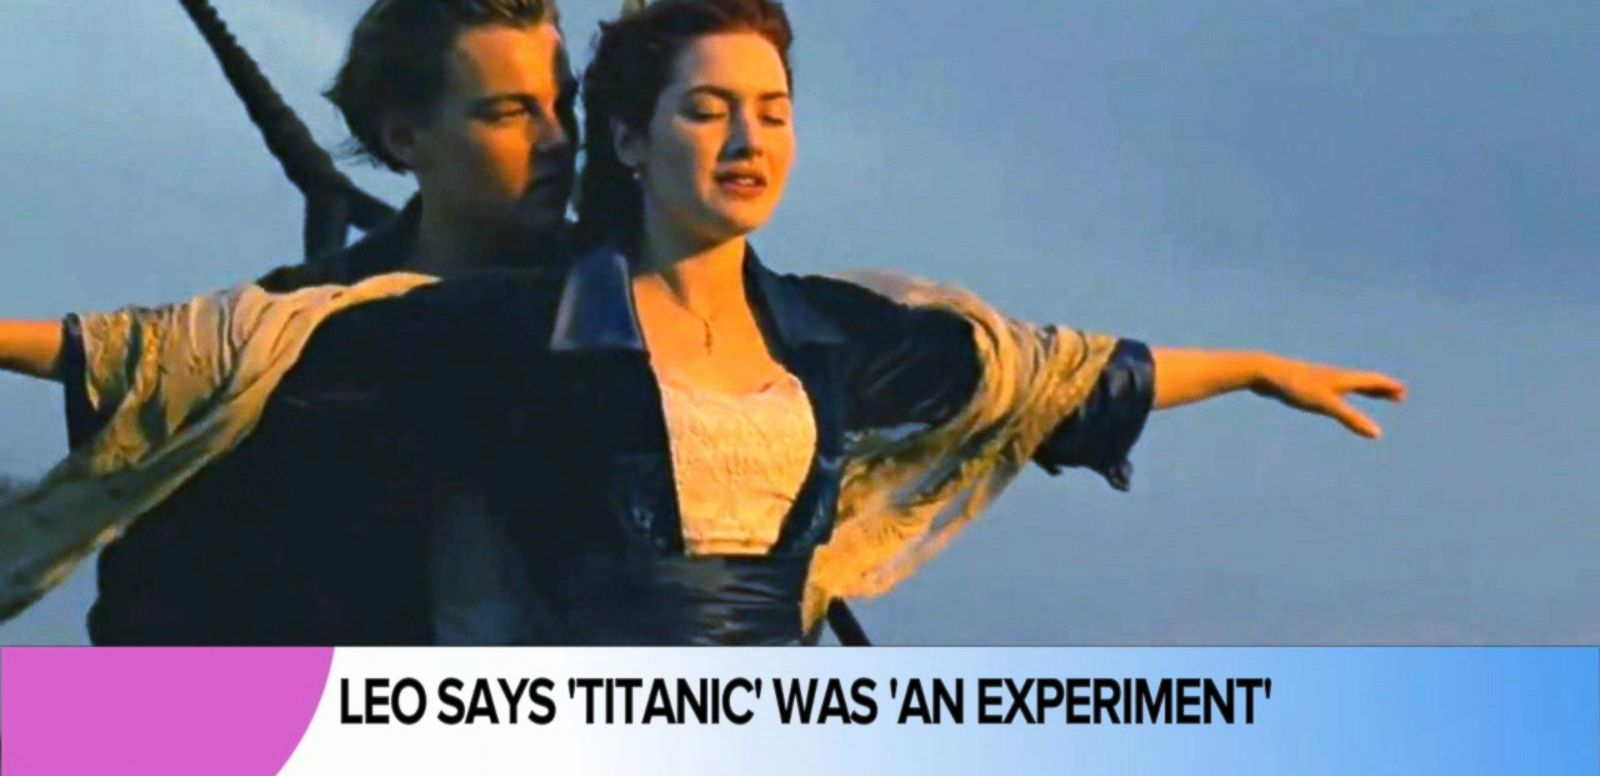 VIDEO: Leonardo DiCaprio Says 'Titanic' Was 'An Experiment'